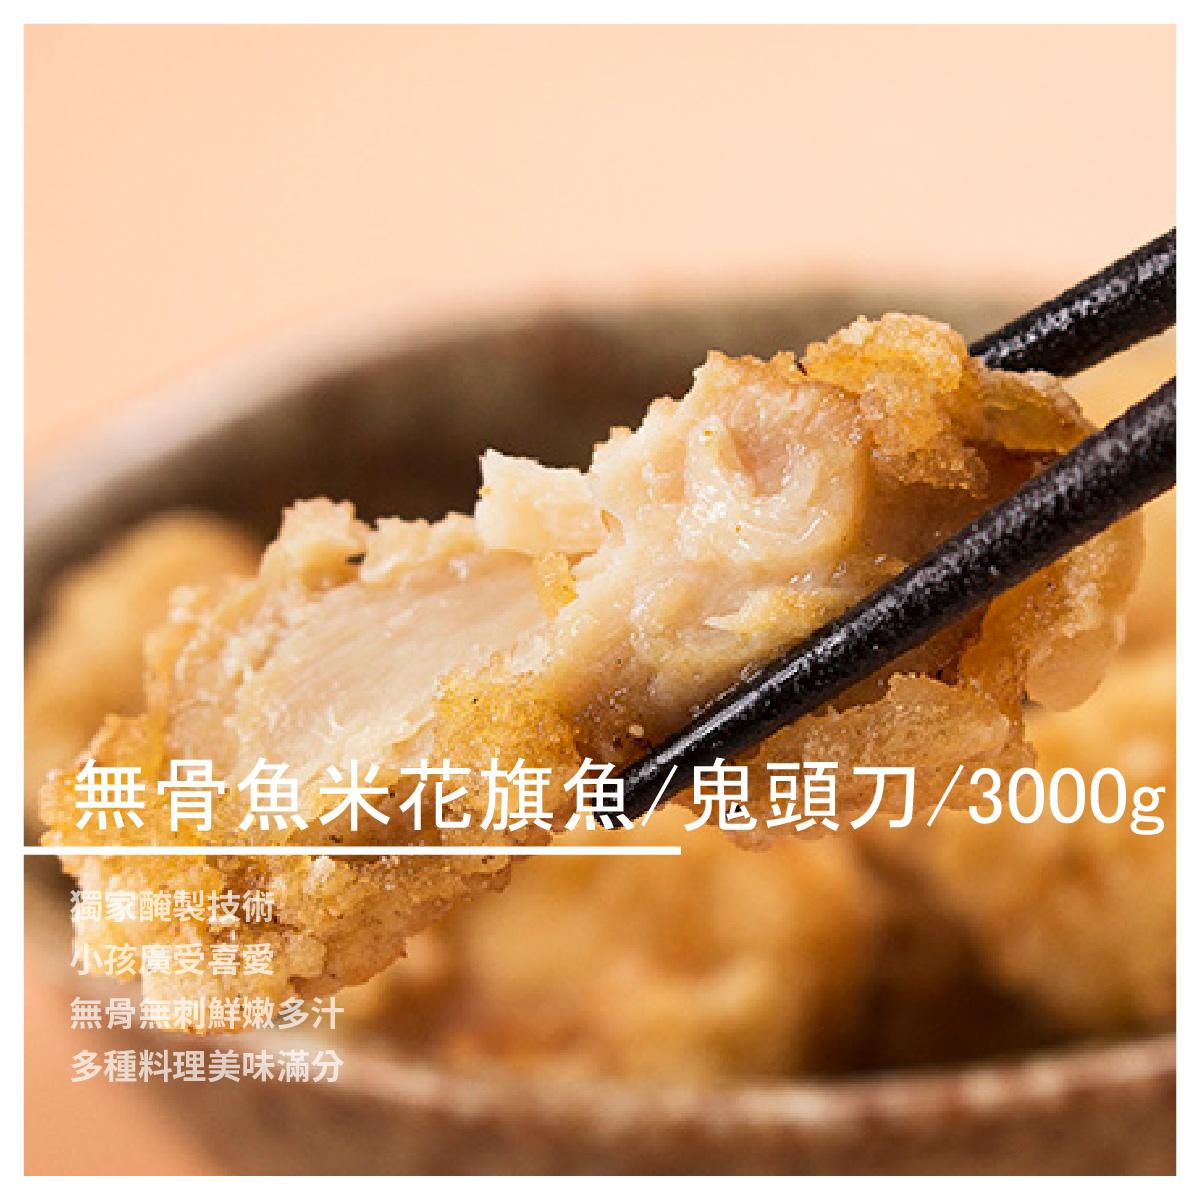 【PP Fish 魚米花】無骨魚米花(旗魚/鬼頭刀)/3000g(1000g3包)/兩款口味